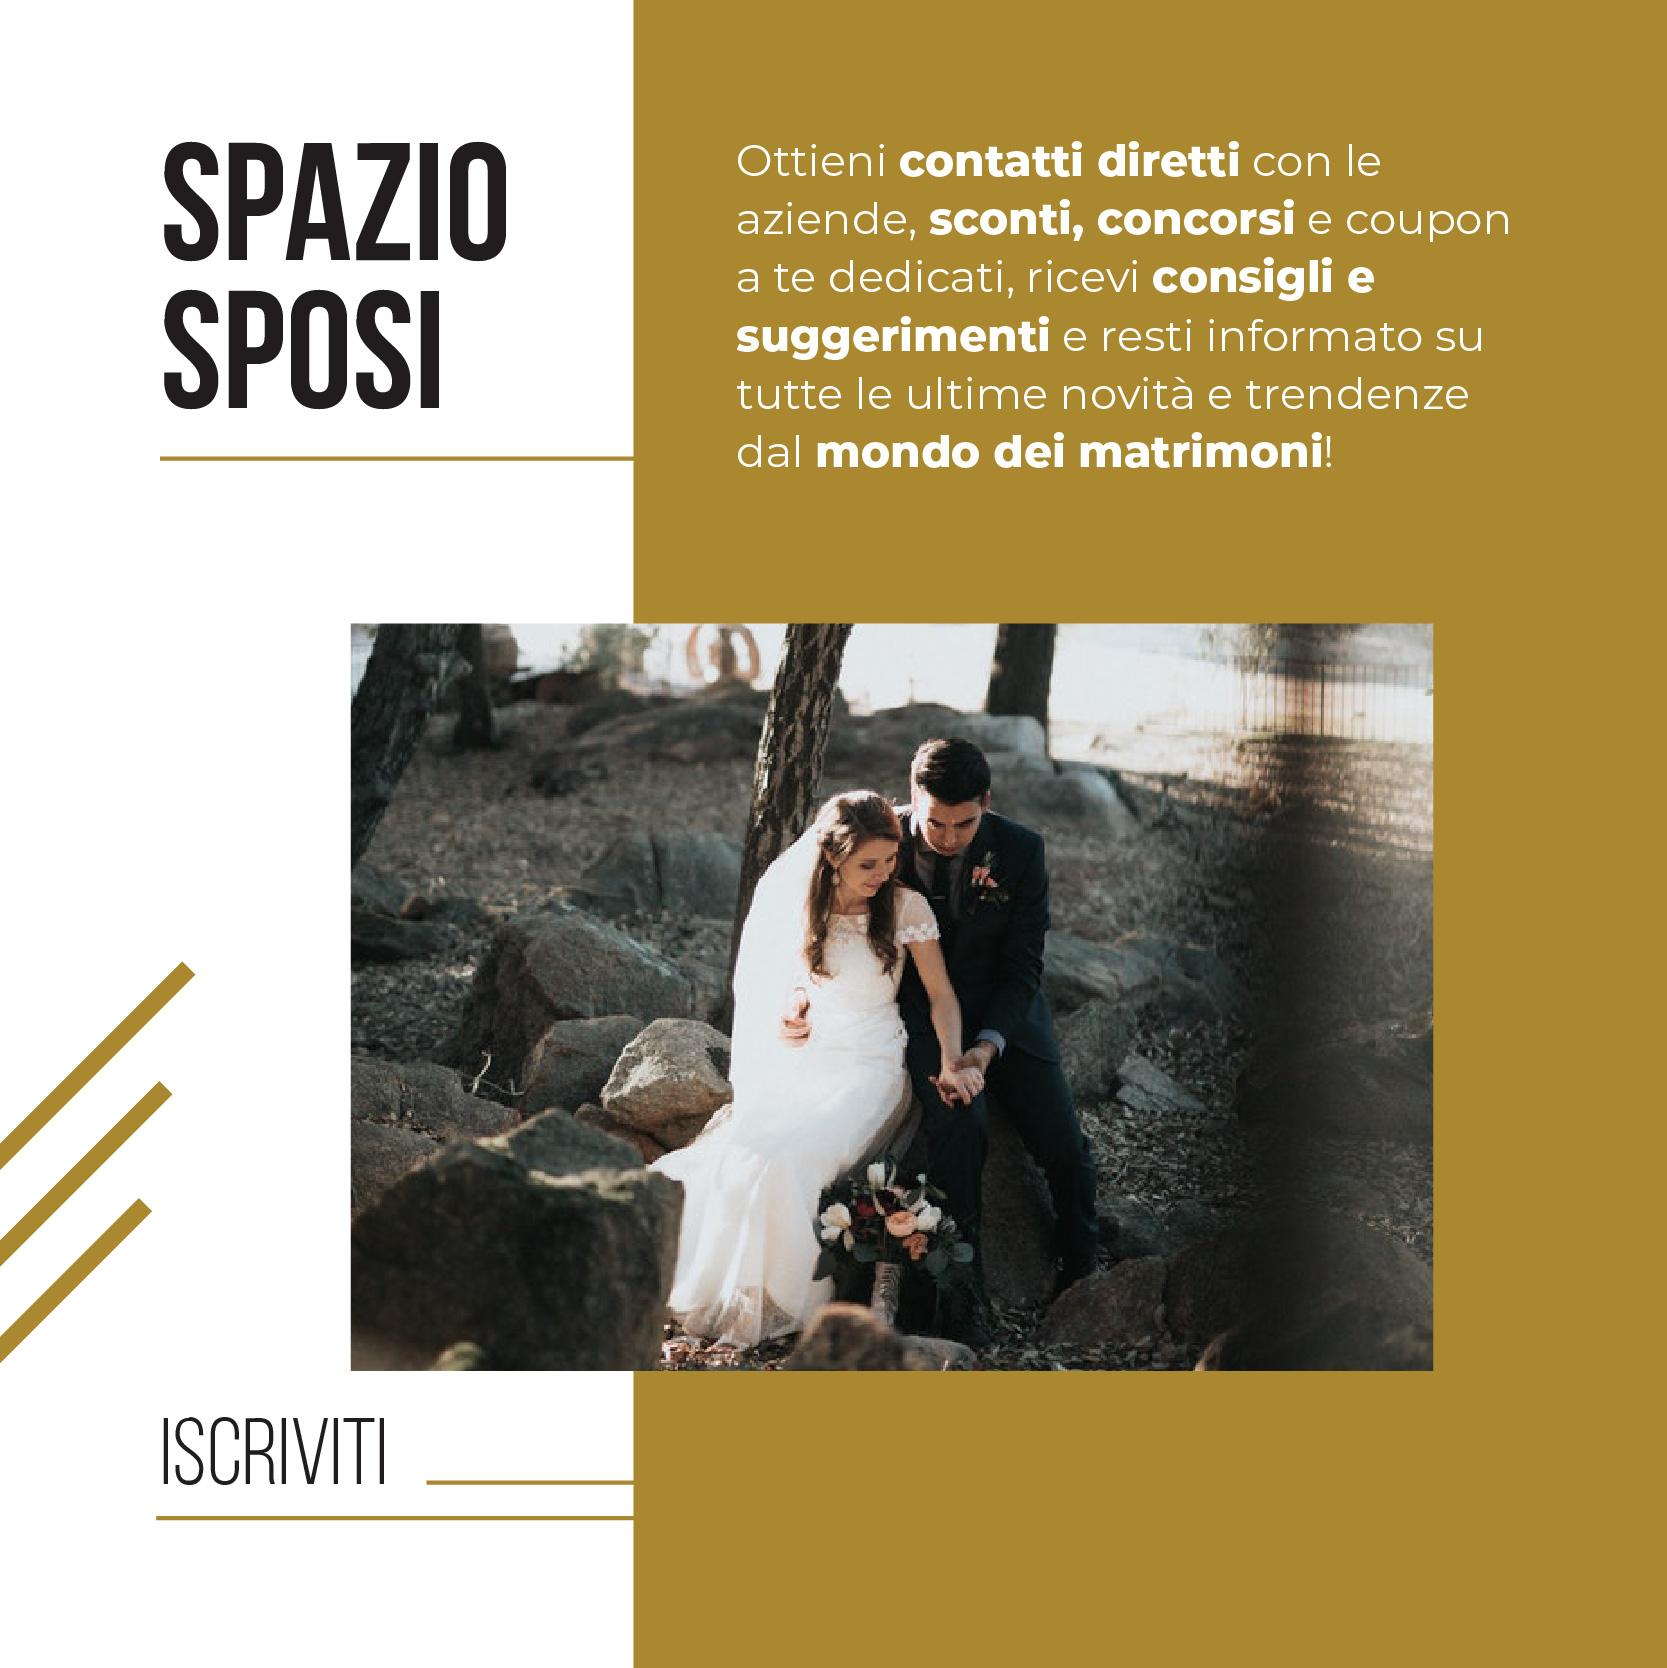 wedding langhe roero spazio sposi matrimonio piemonte .jpg